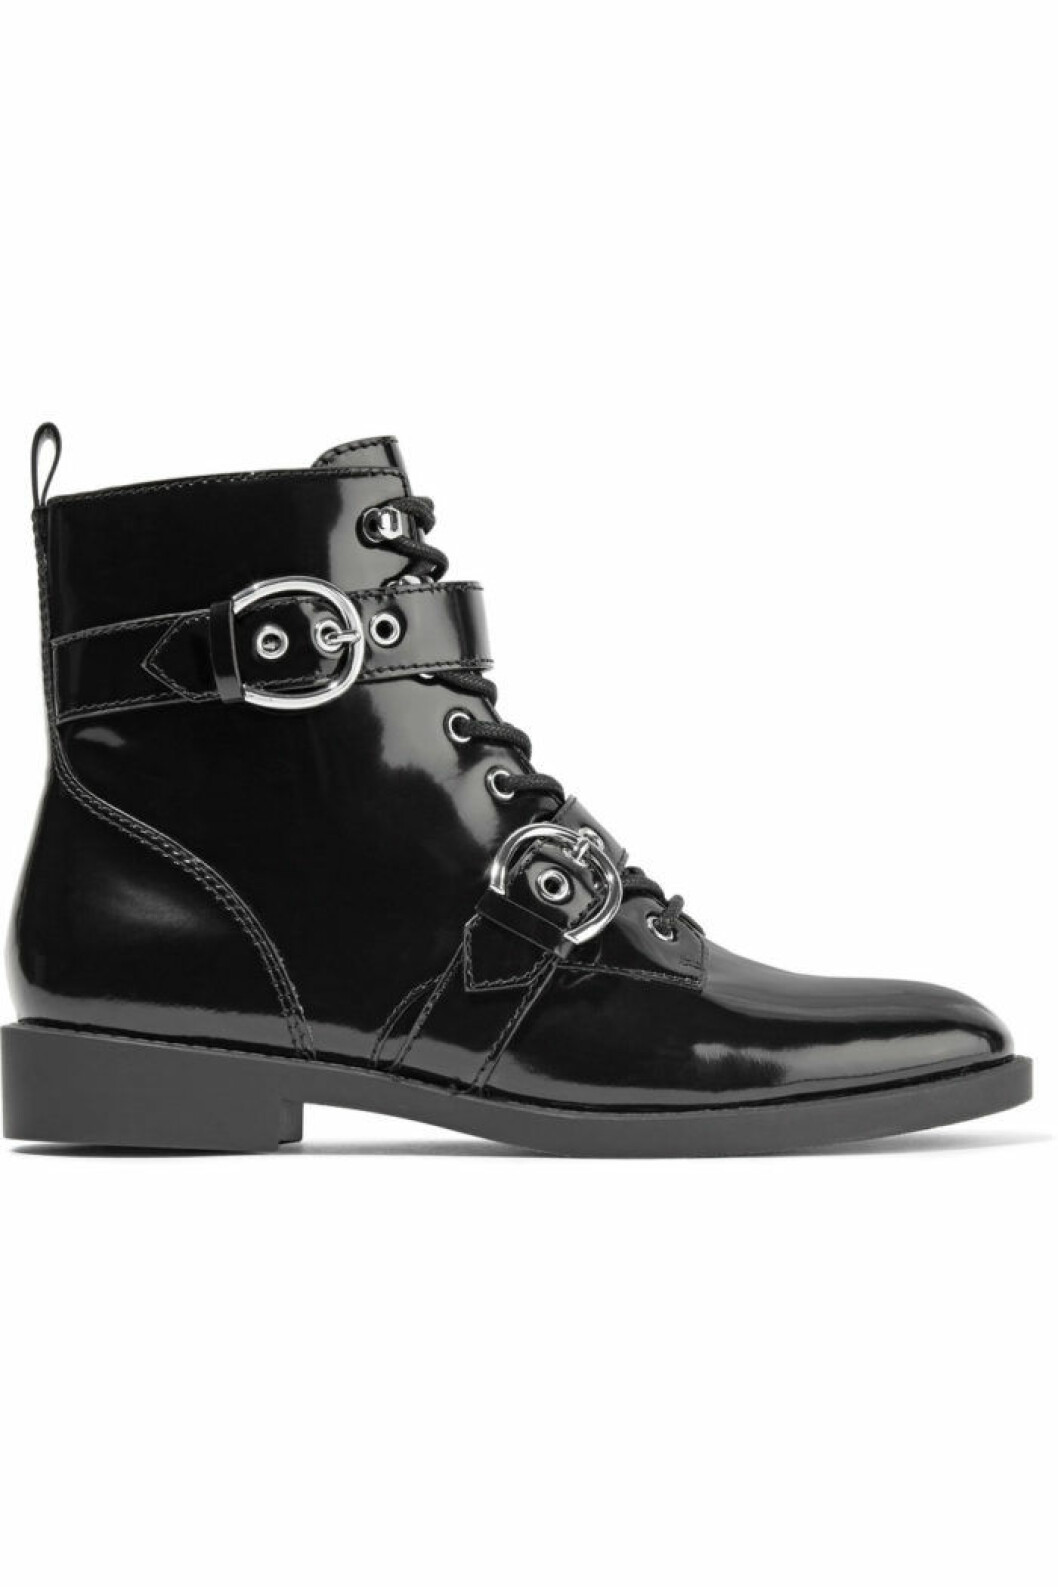 boots-marc-jacobs-net-a-porter